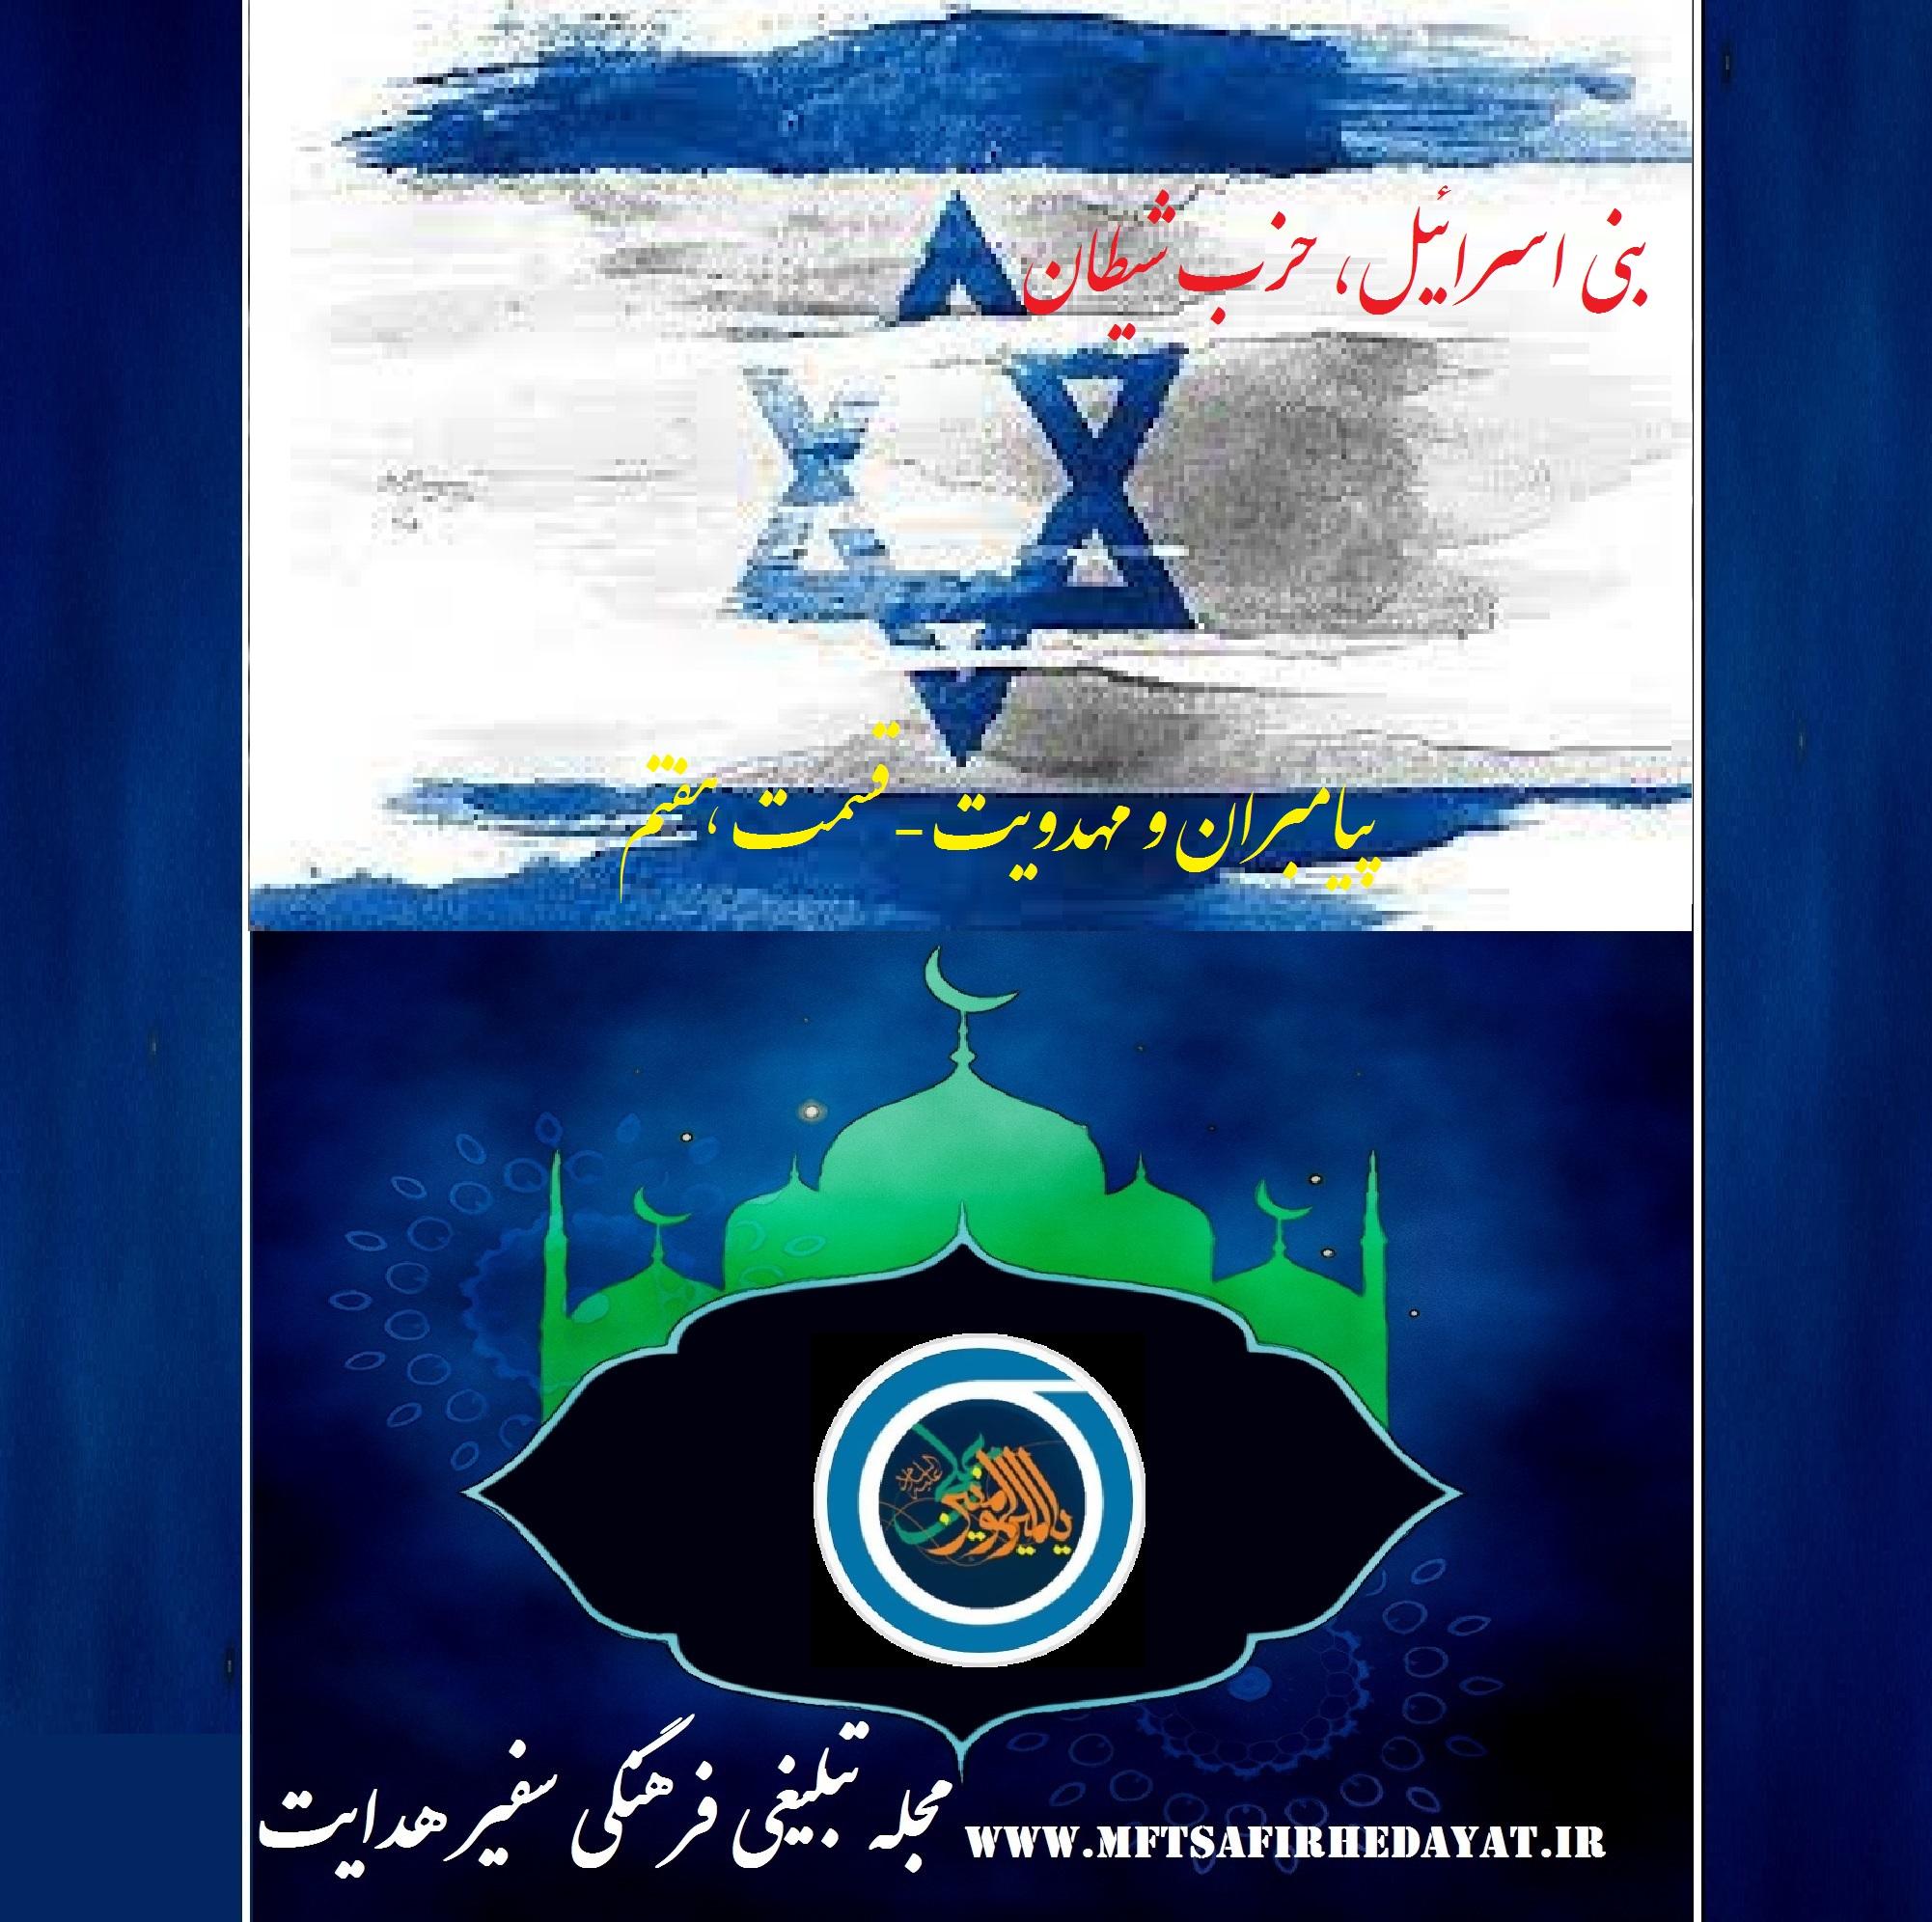 بنی اسرائیل، حزب شیطان